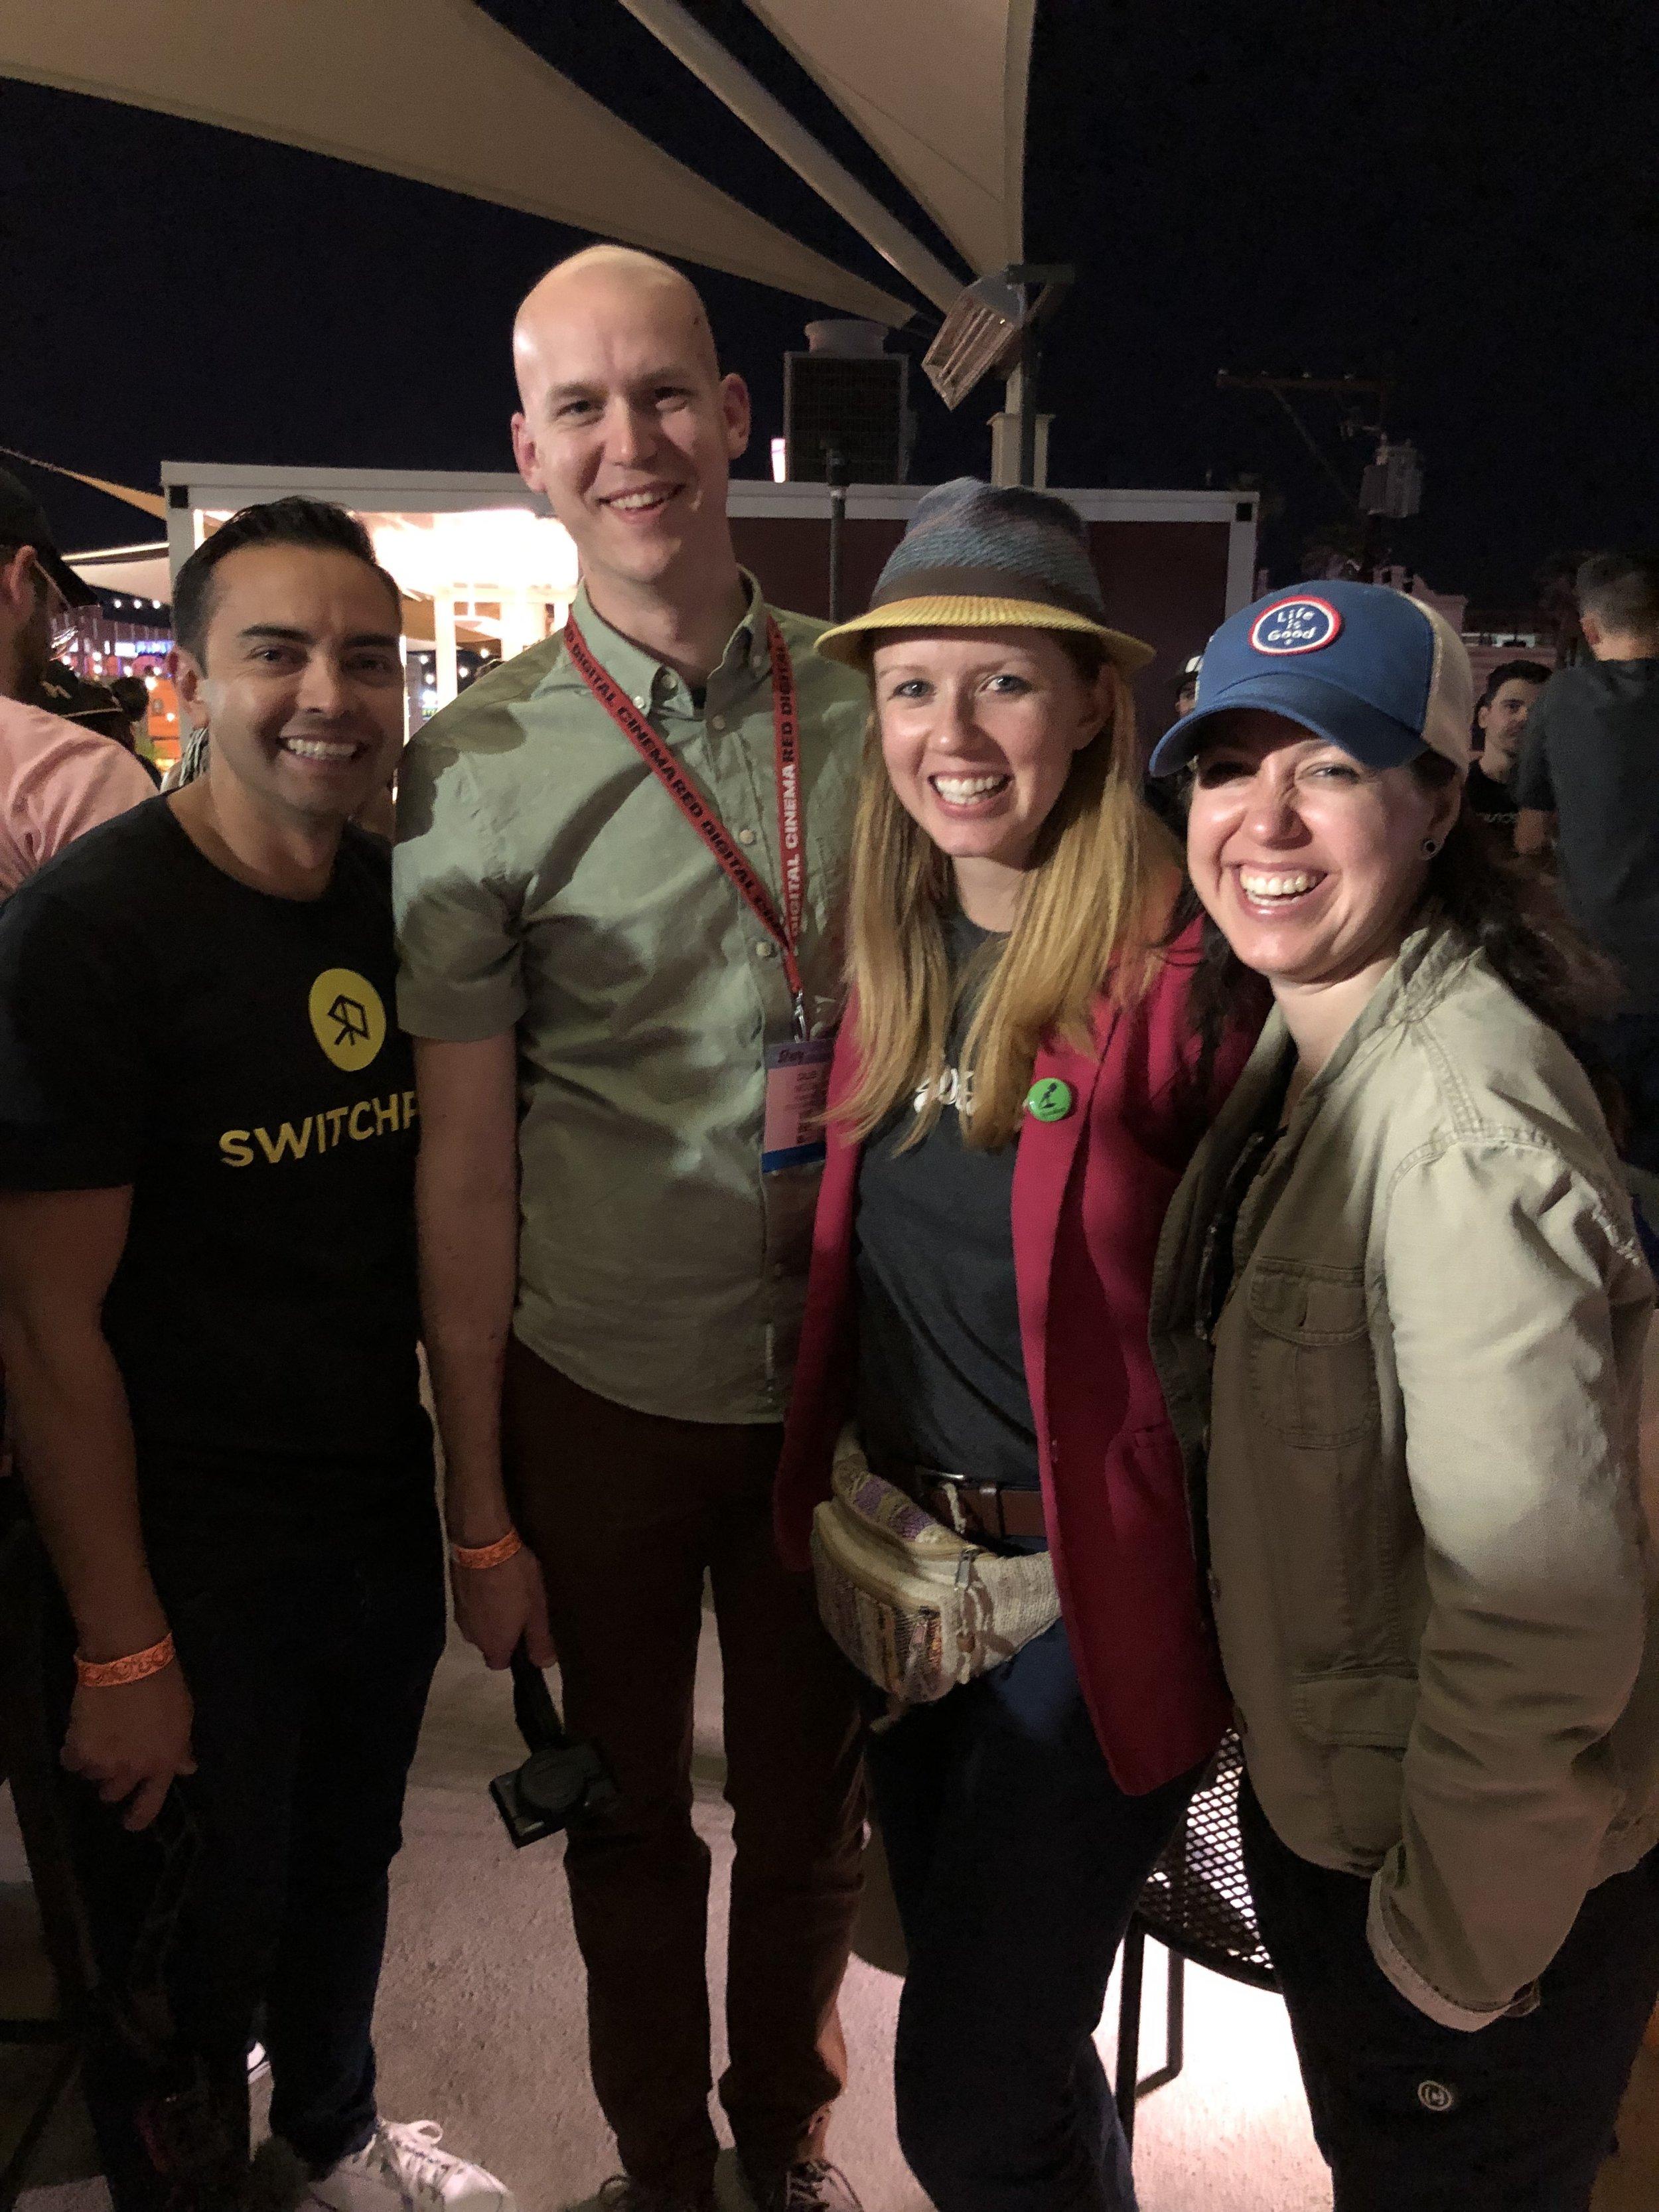 Pat Flynn, Caleb Wojcik, and Premiere Gal Team at Creator Meetup.